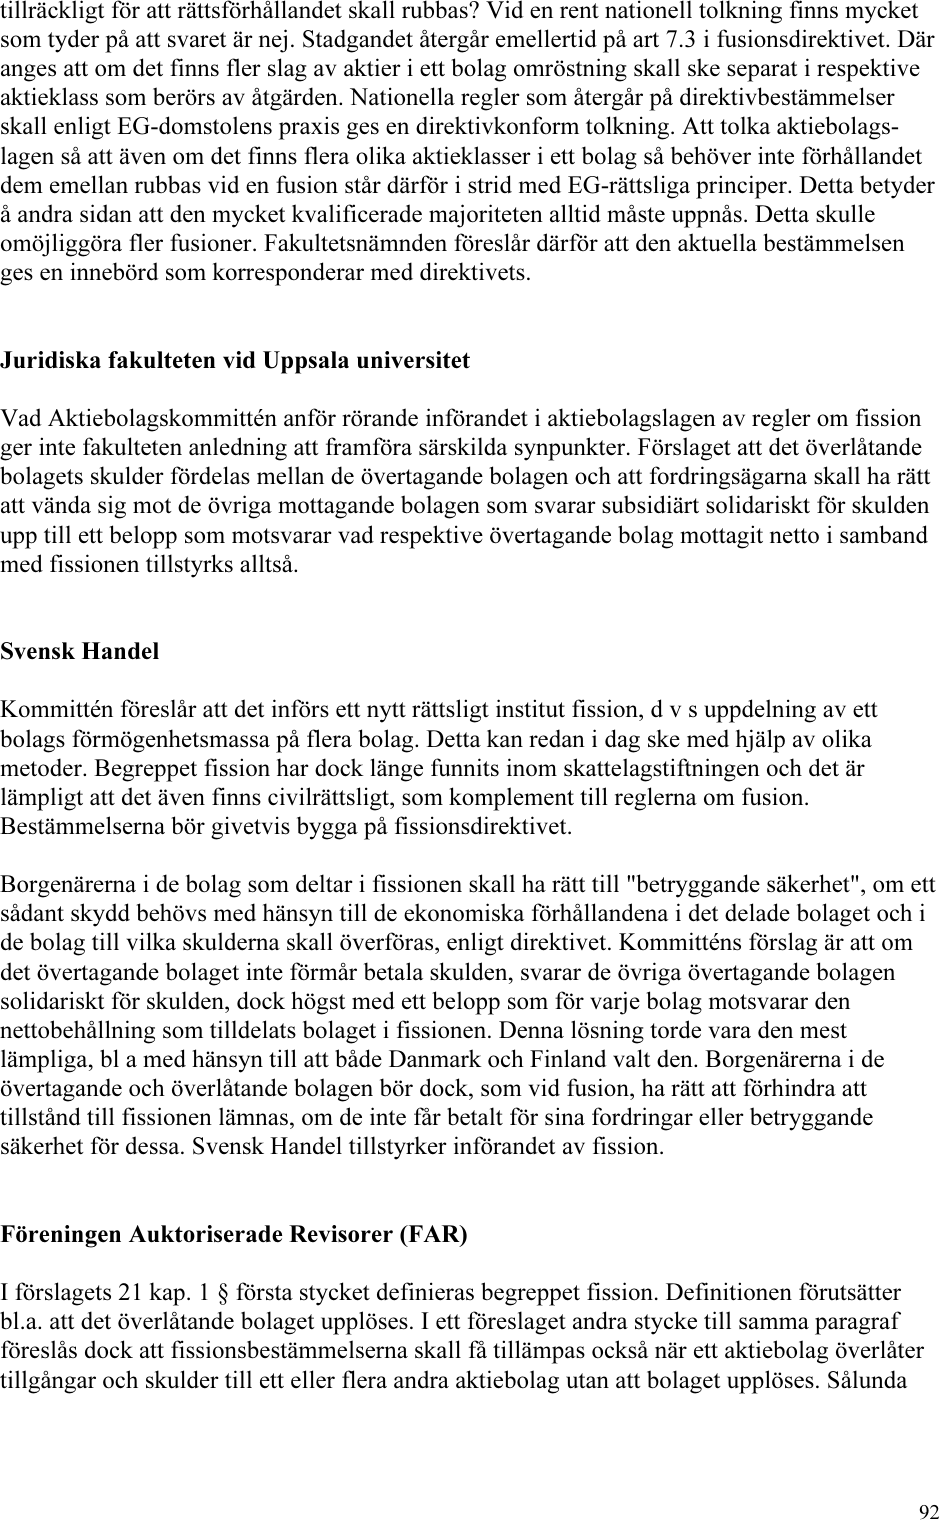 Foreningssparbanken majoritetsagare i norskt bolag